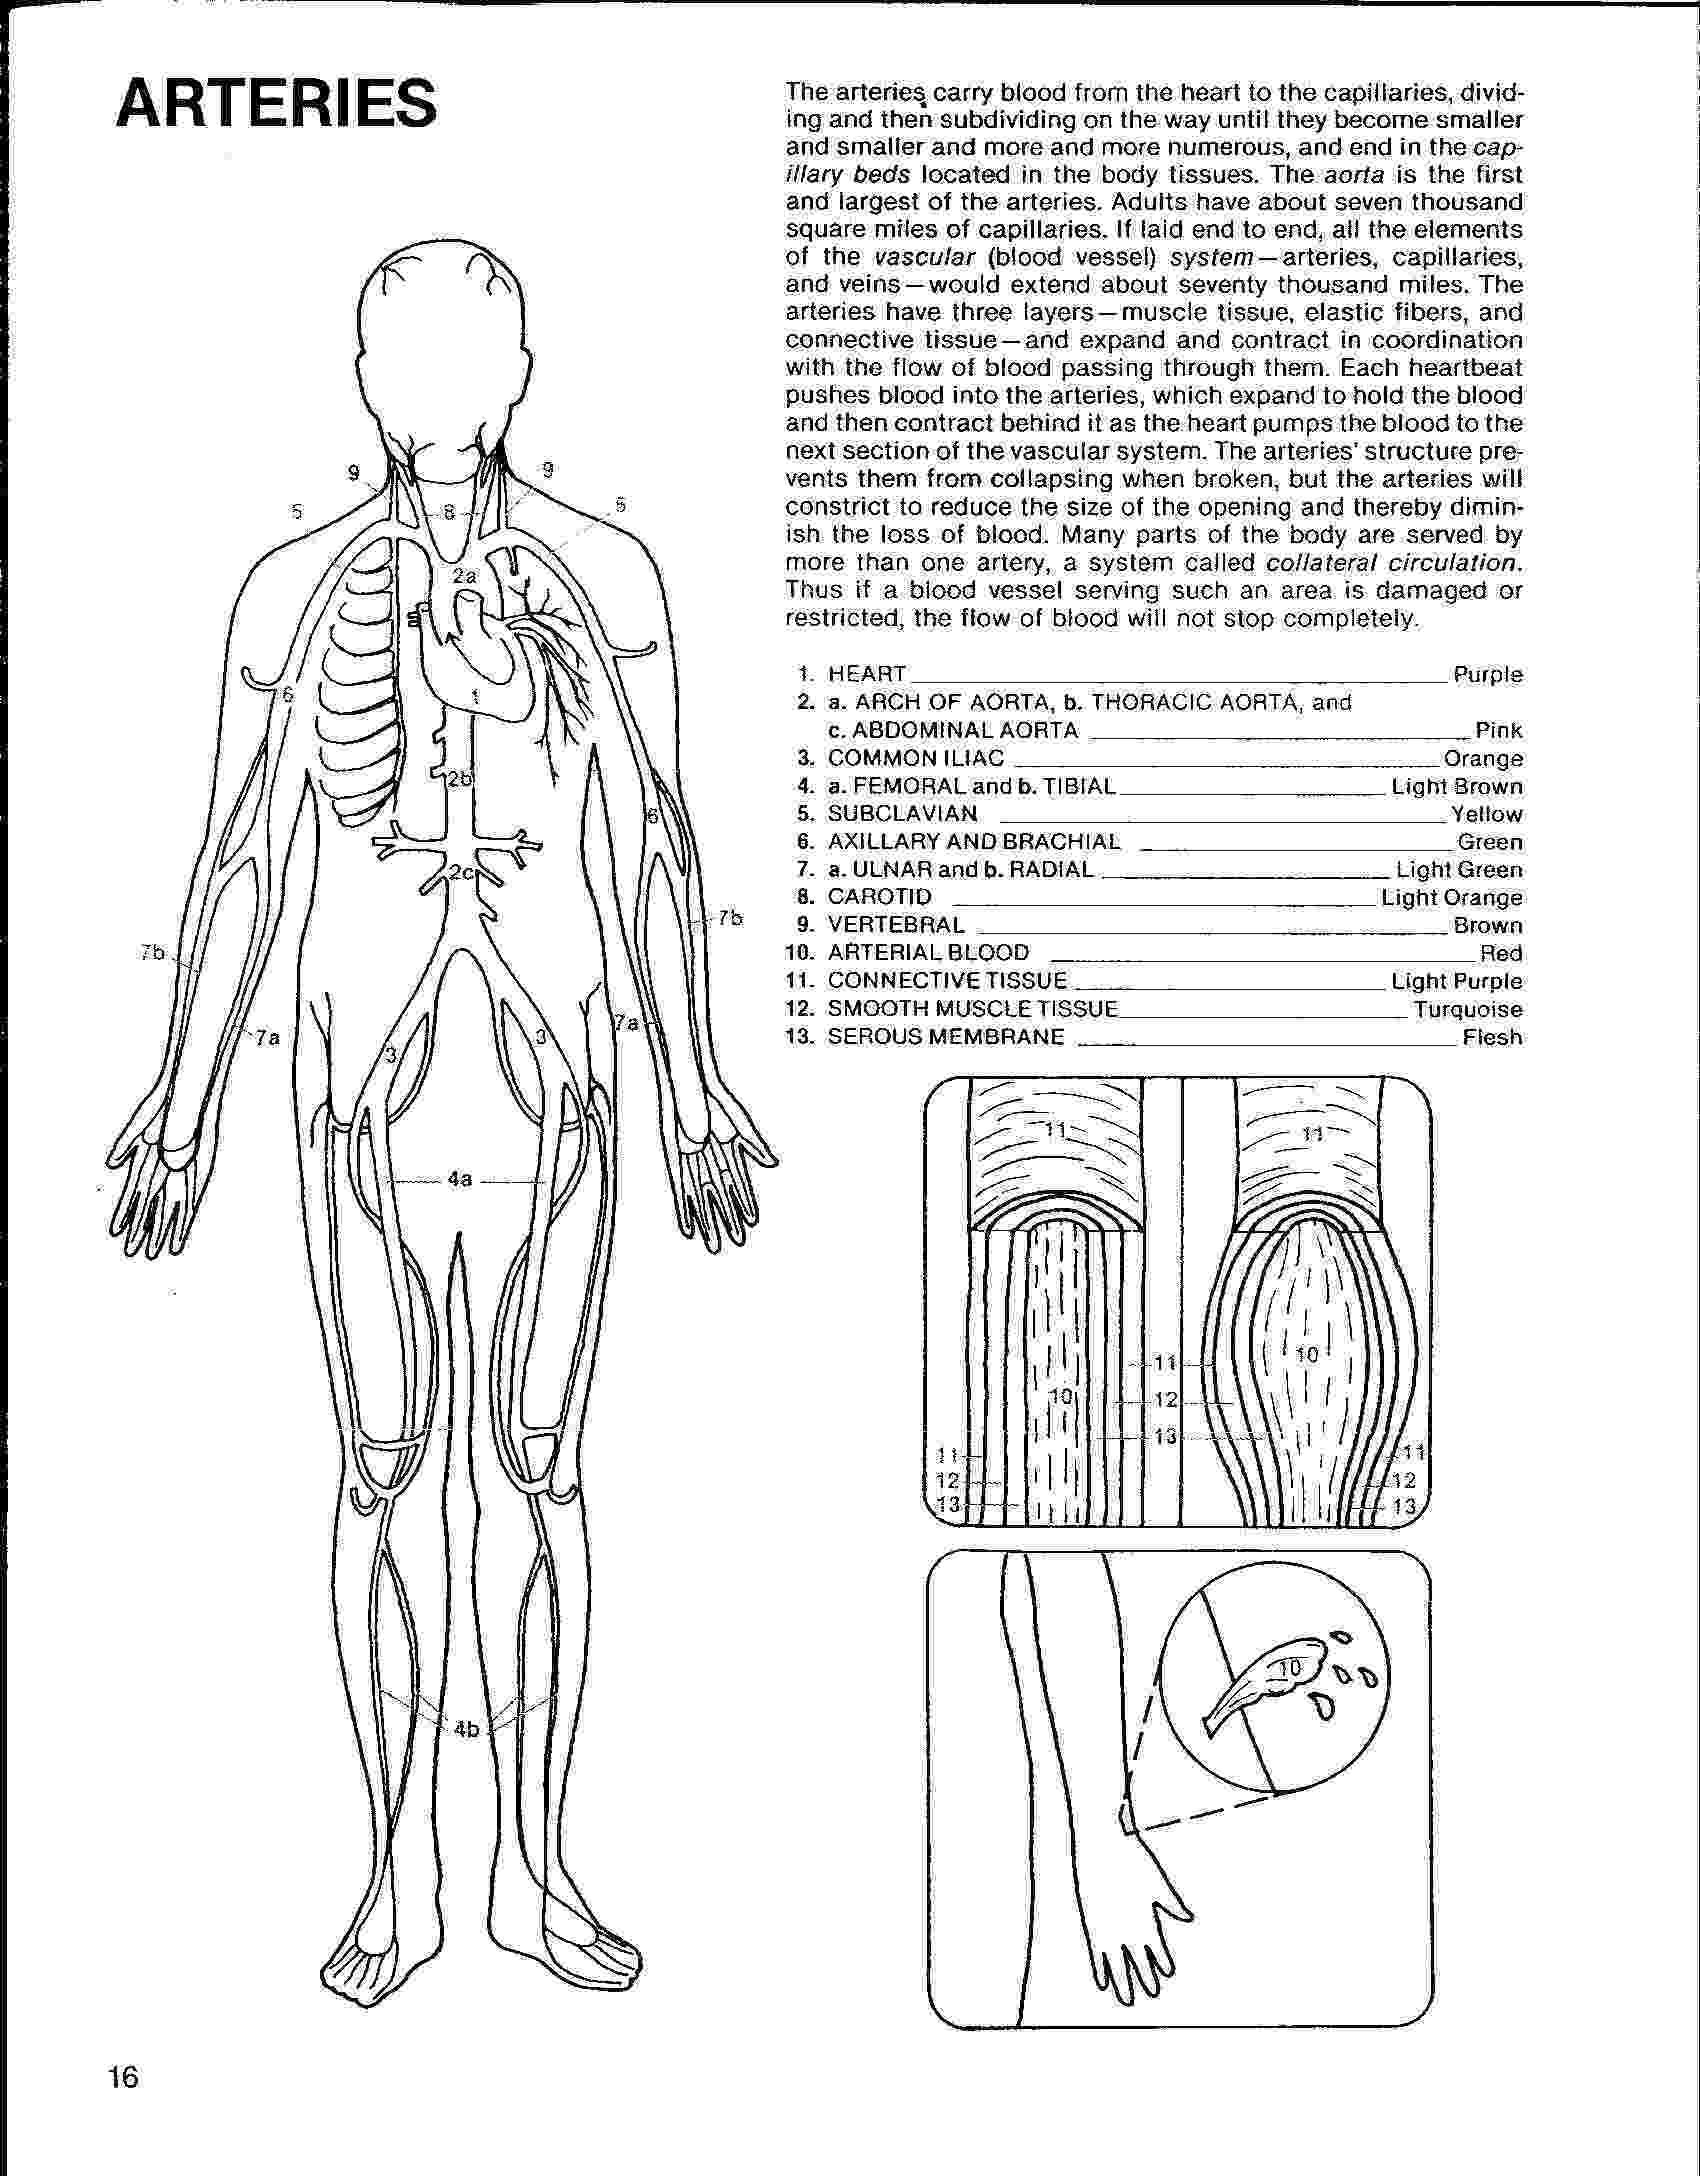 coloring pages circulatory system circulatory system coloring pages sketch coloring page system coloring pages circulatory